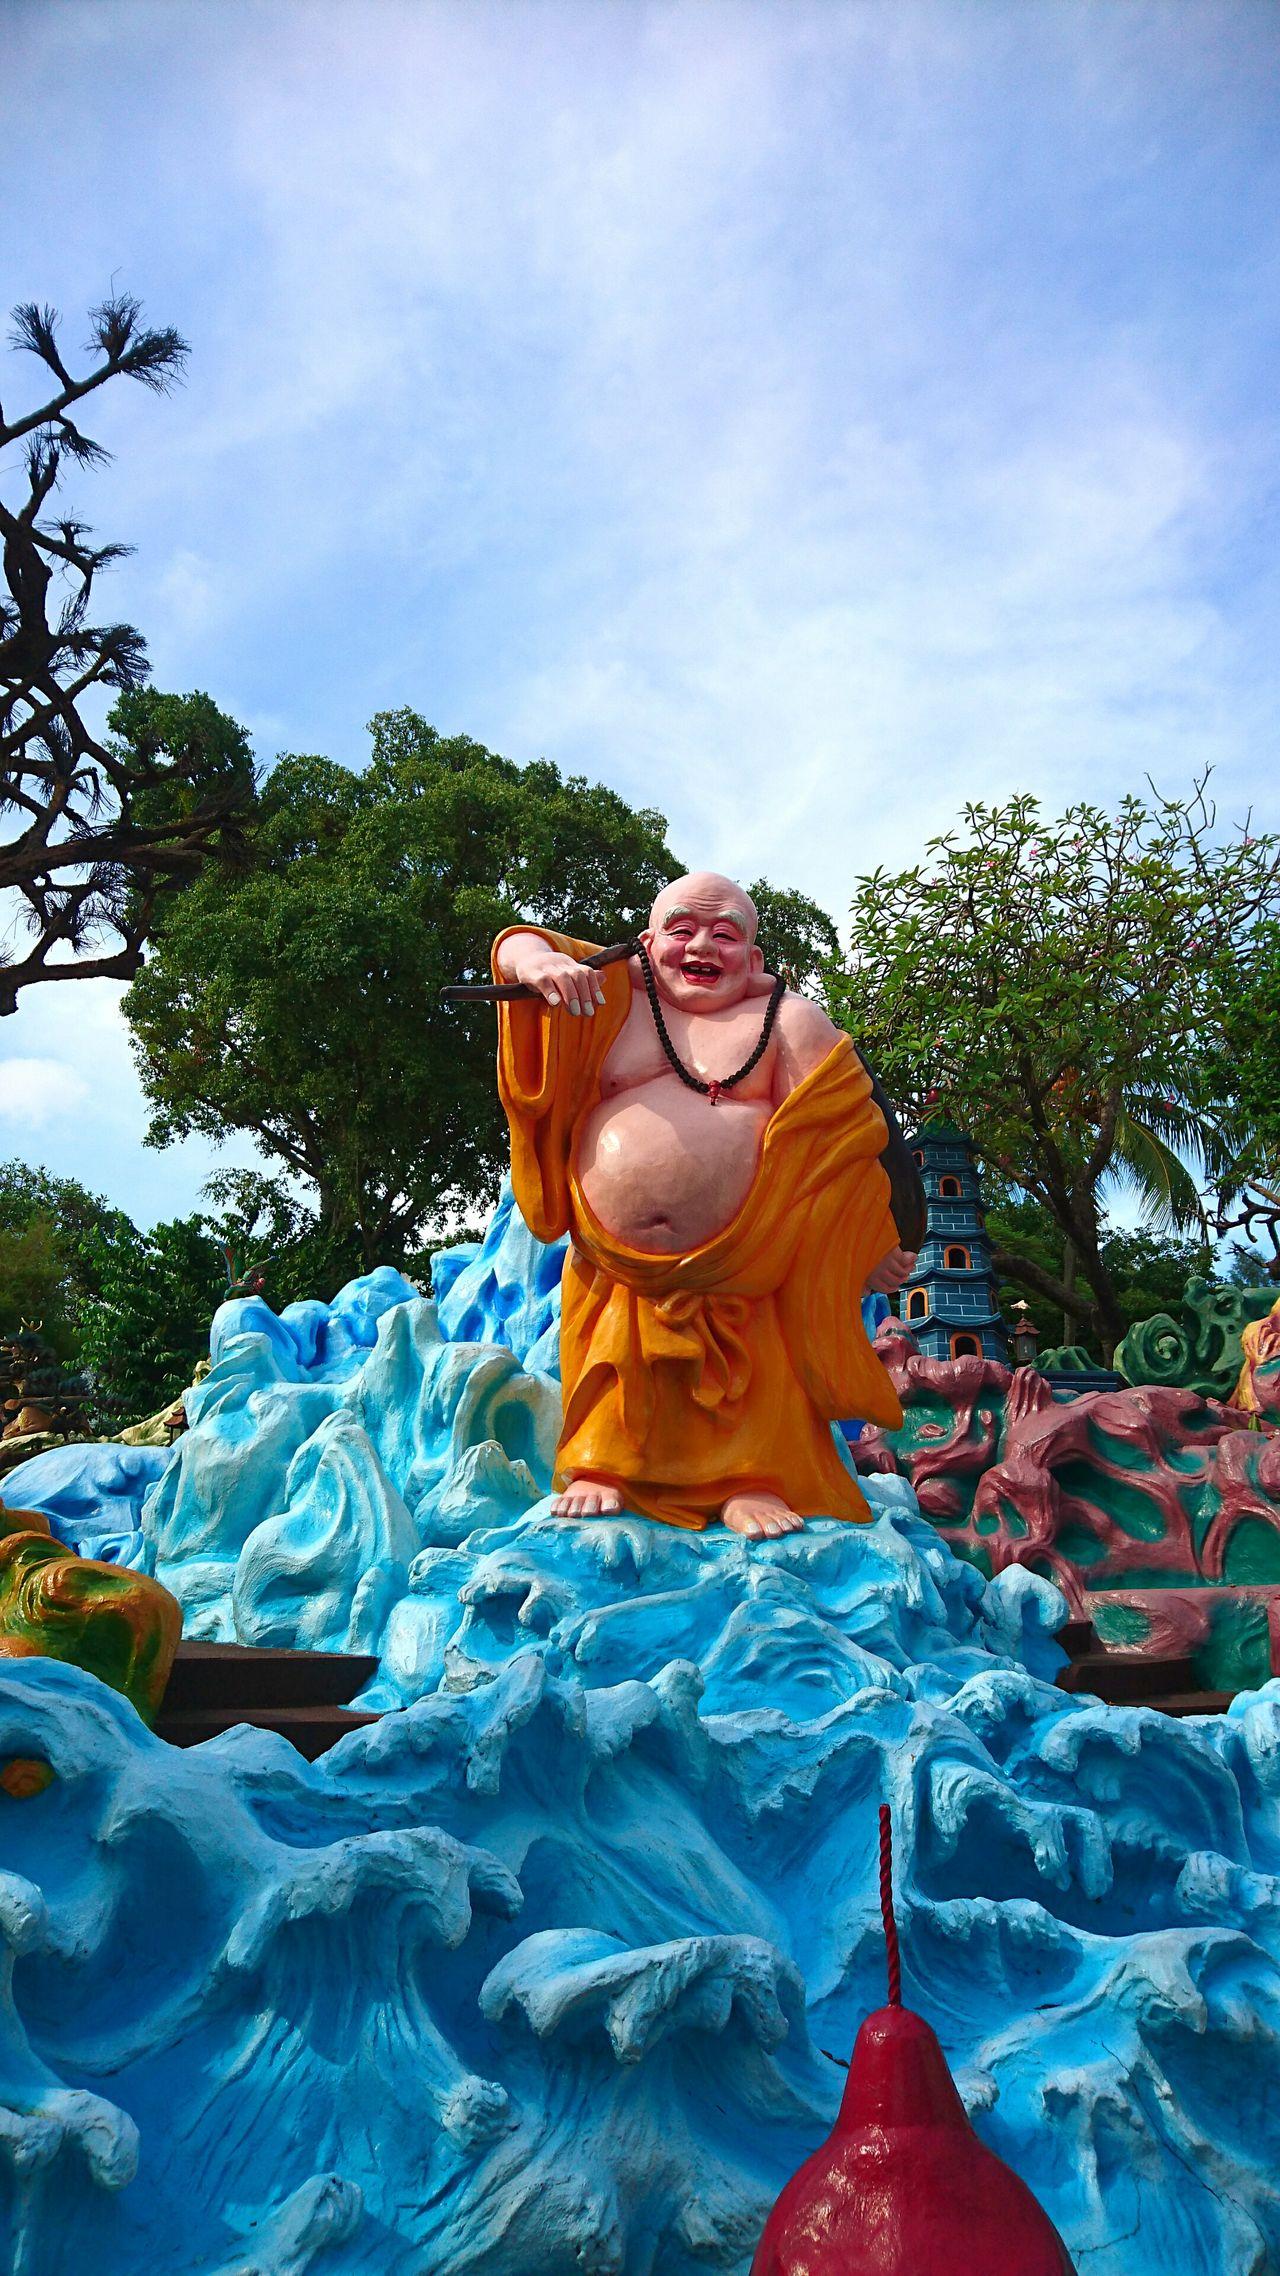 Bright Day Randomshot Singapore Throwback Statue Hawparvilla